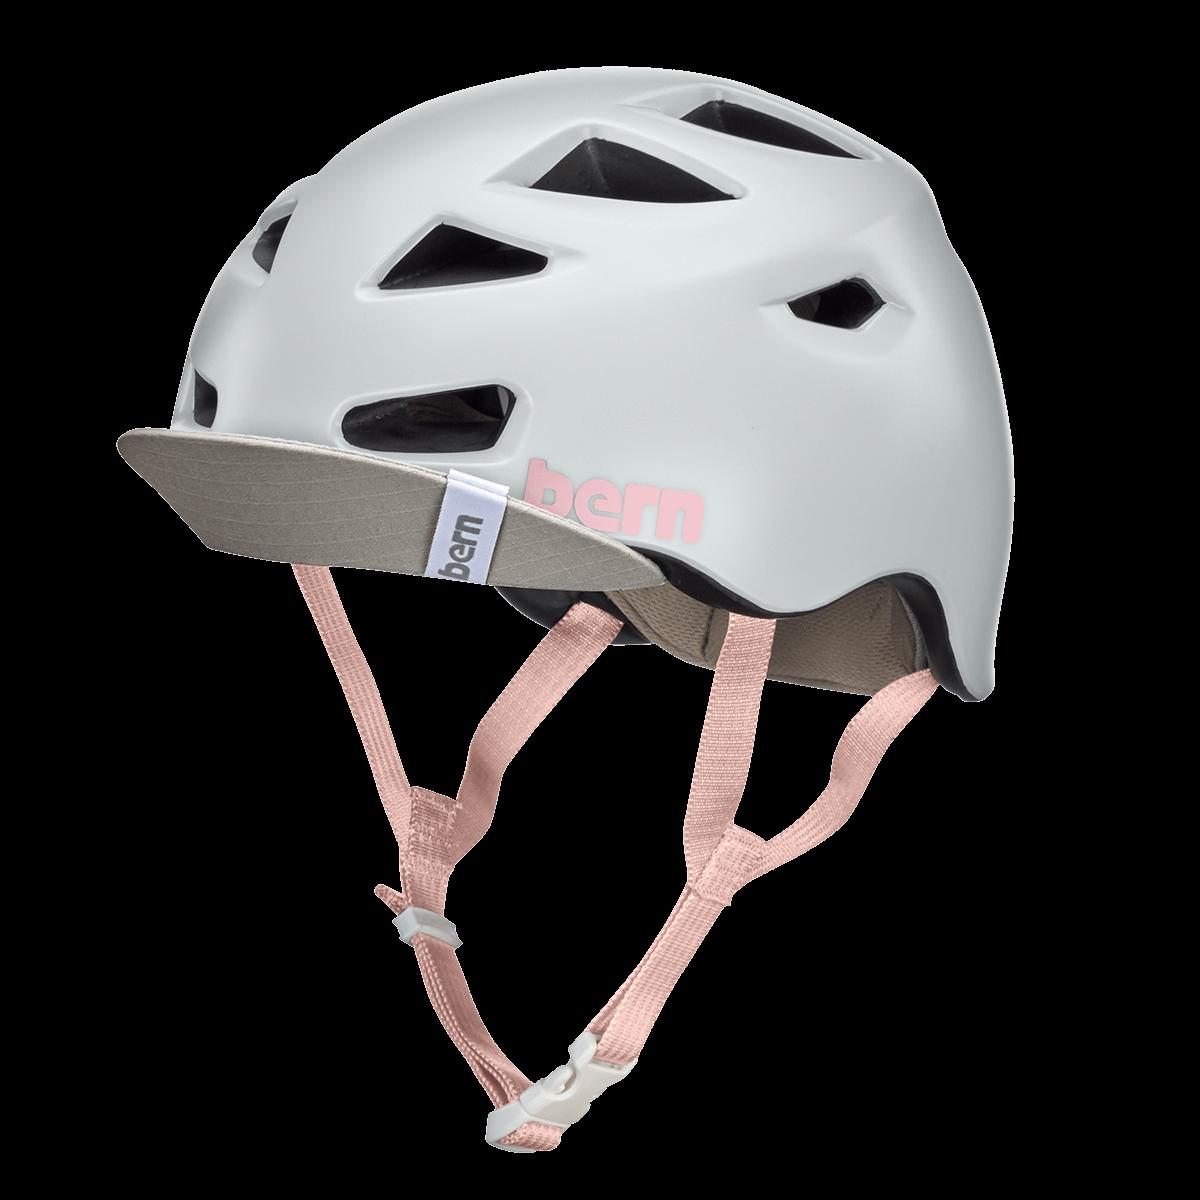 Casque Bern Melrose-Satin-Light-Grey-1 Esprit vélo